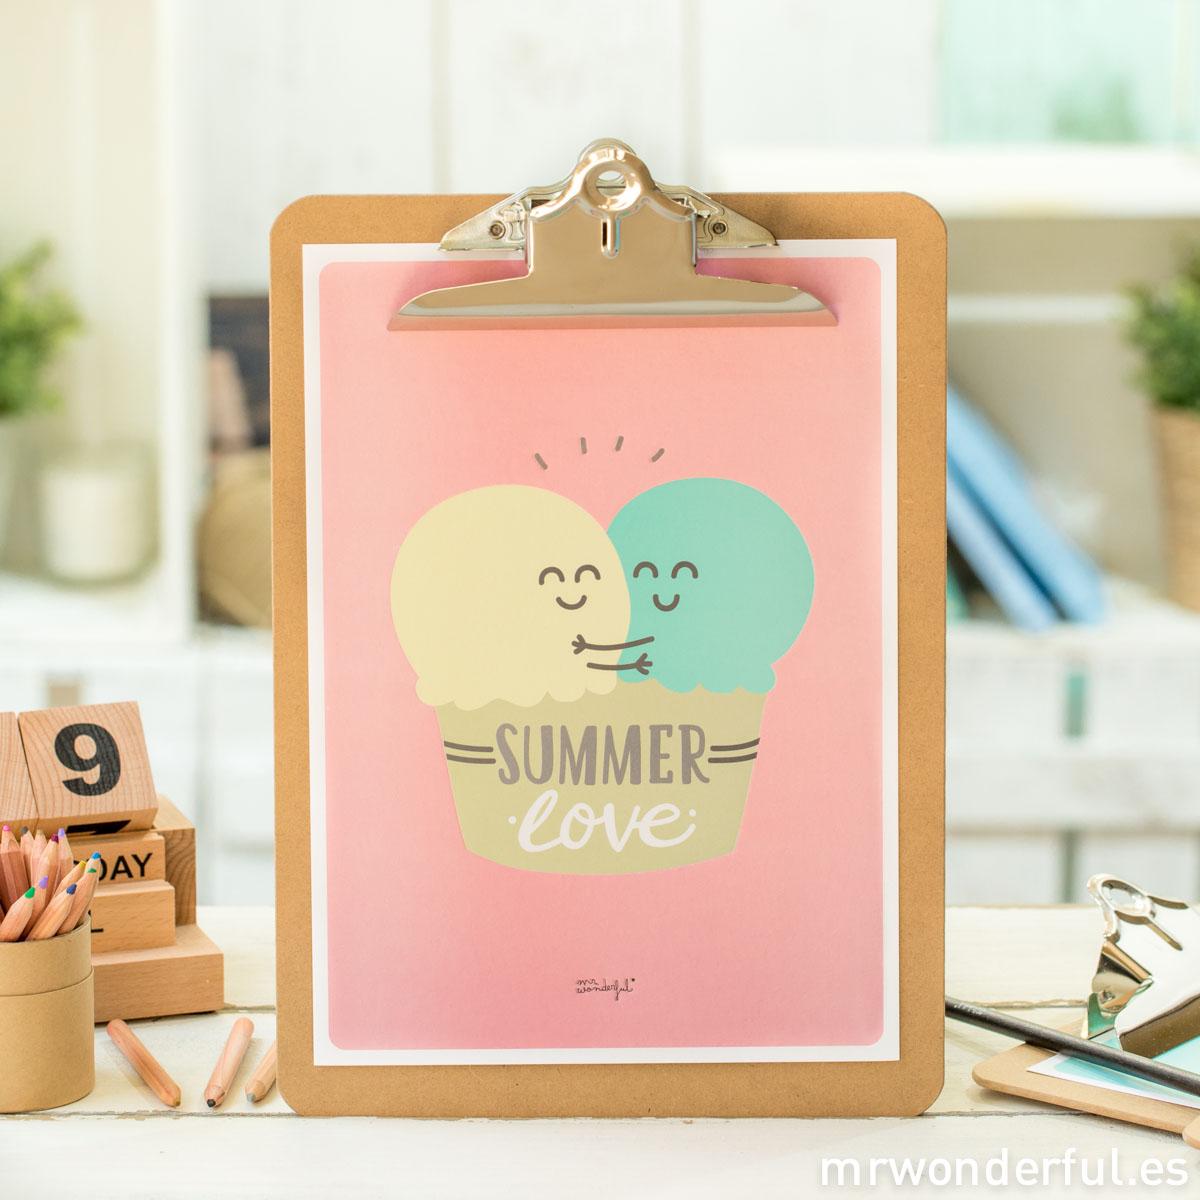 mrwonderful_LAM-SUMMER-09_lamina-summer-love-3